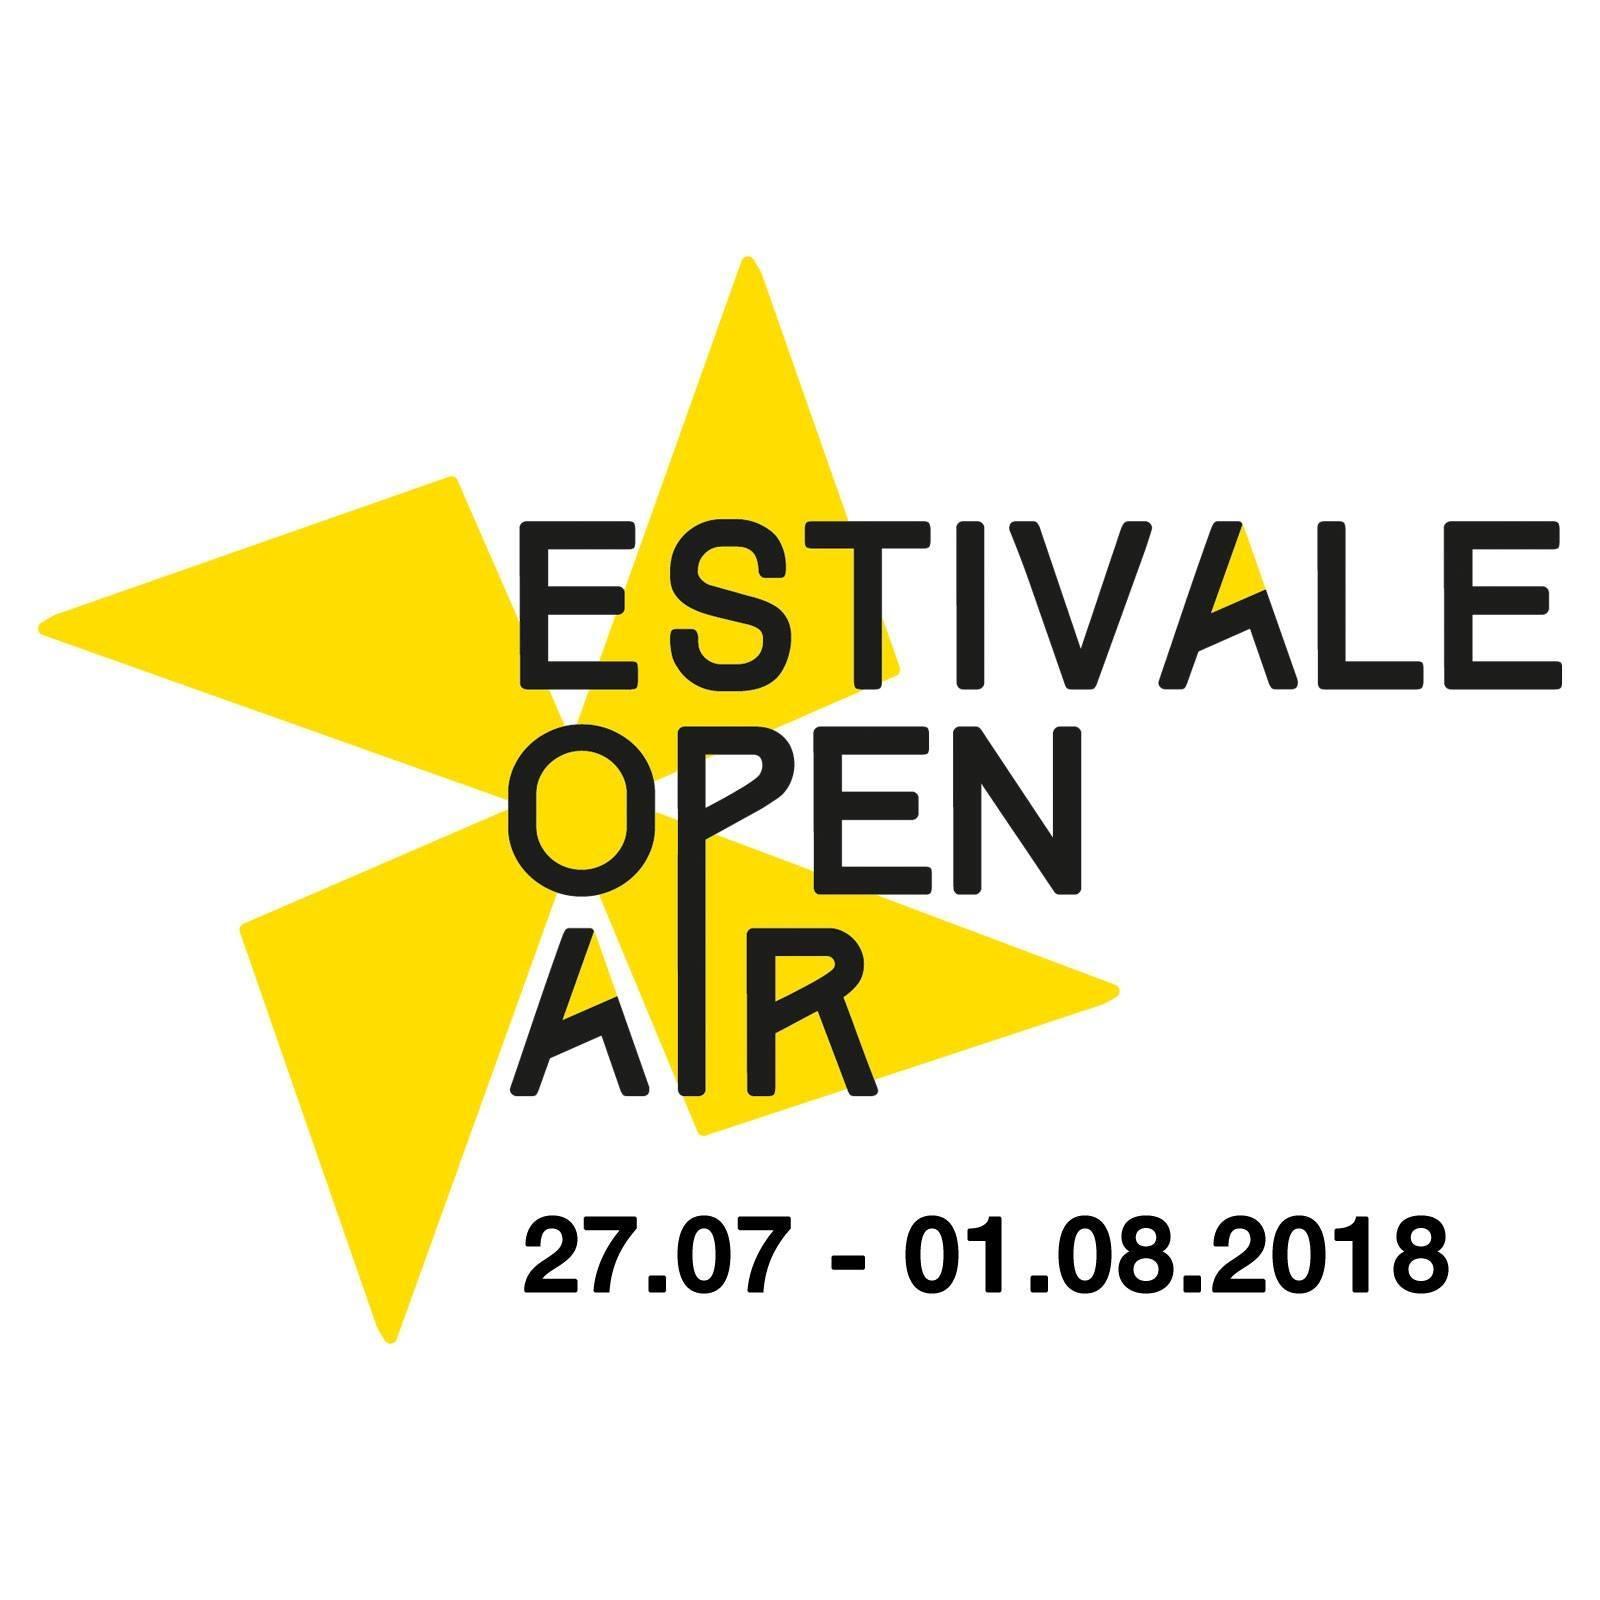 Vald @ Estivale Open Air Festival